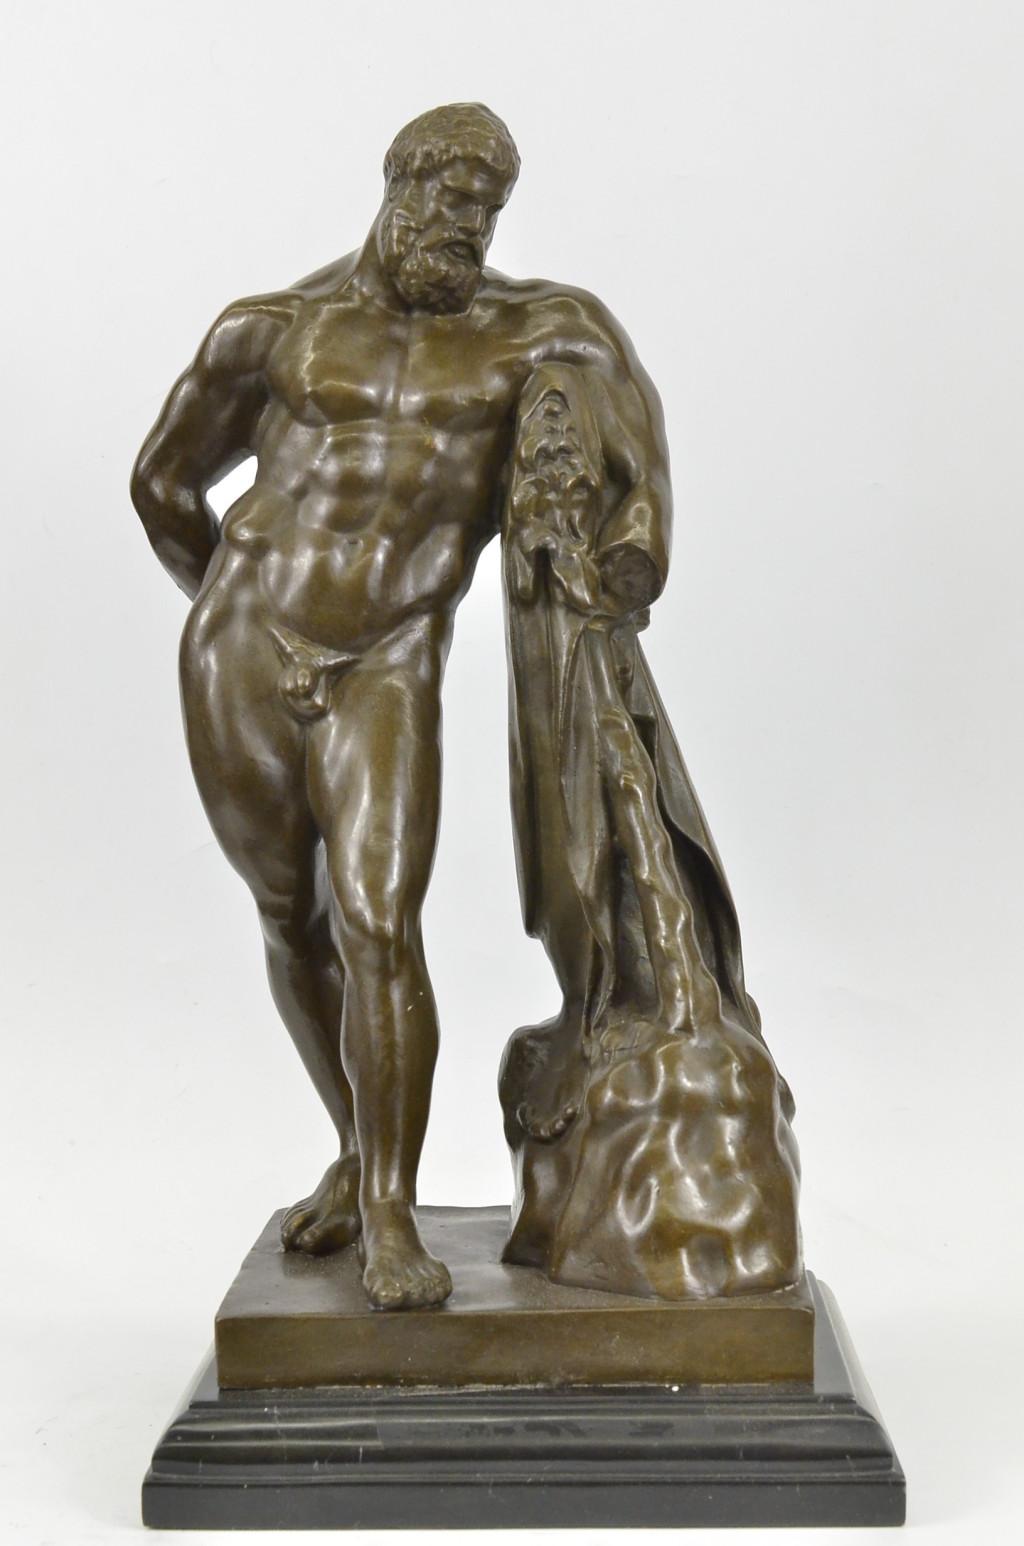 signed glycon hercules r greek myth herculesart deco bronze sculpture statue cad. Black Bedroom Furniture Sets. Home Design Ideas